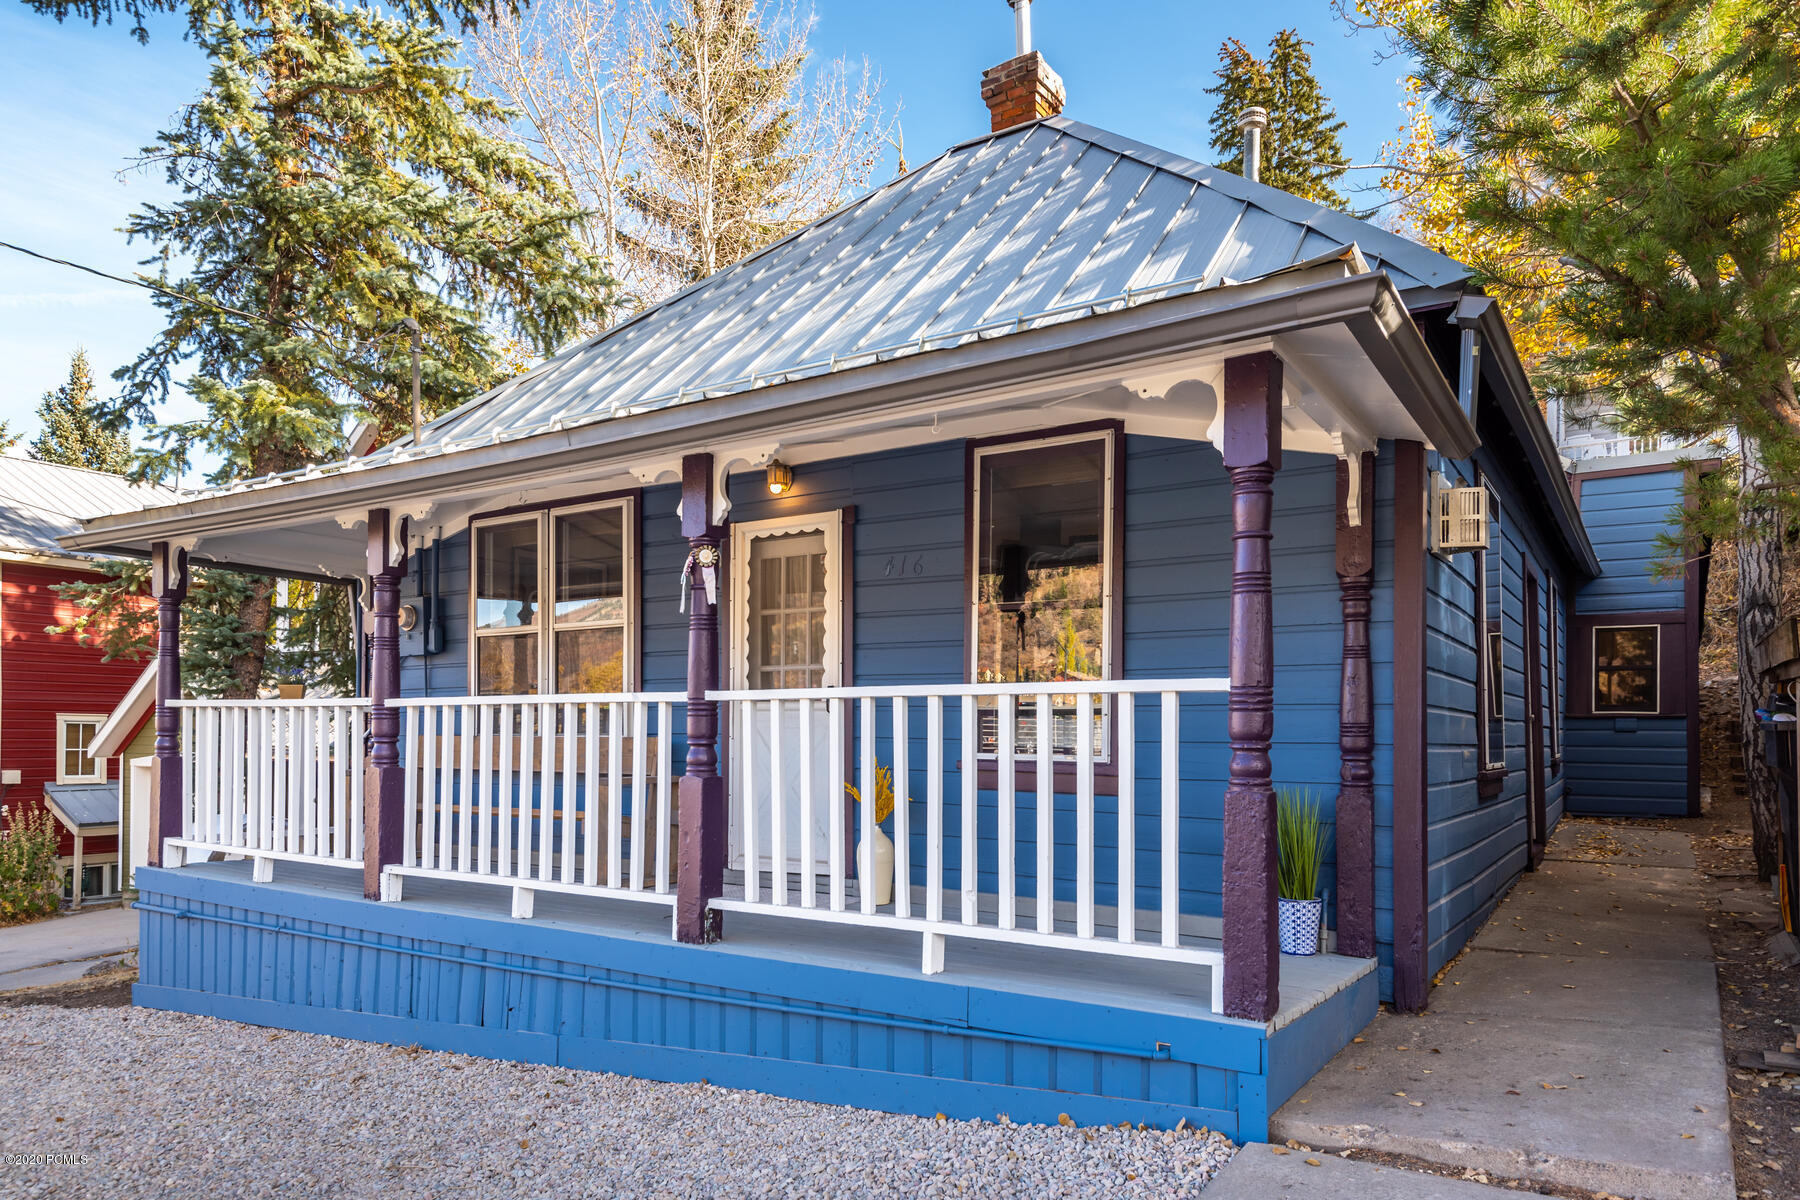 416 Marsac Avenue, Park City, Utah 84060, 2 Bedrooms Bedrooms, ,2 BathroomsBathrooms,Single Family,For Sale,Marsac,12004132